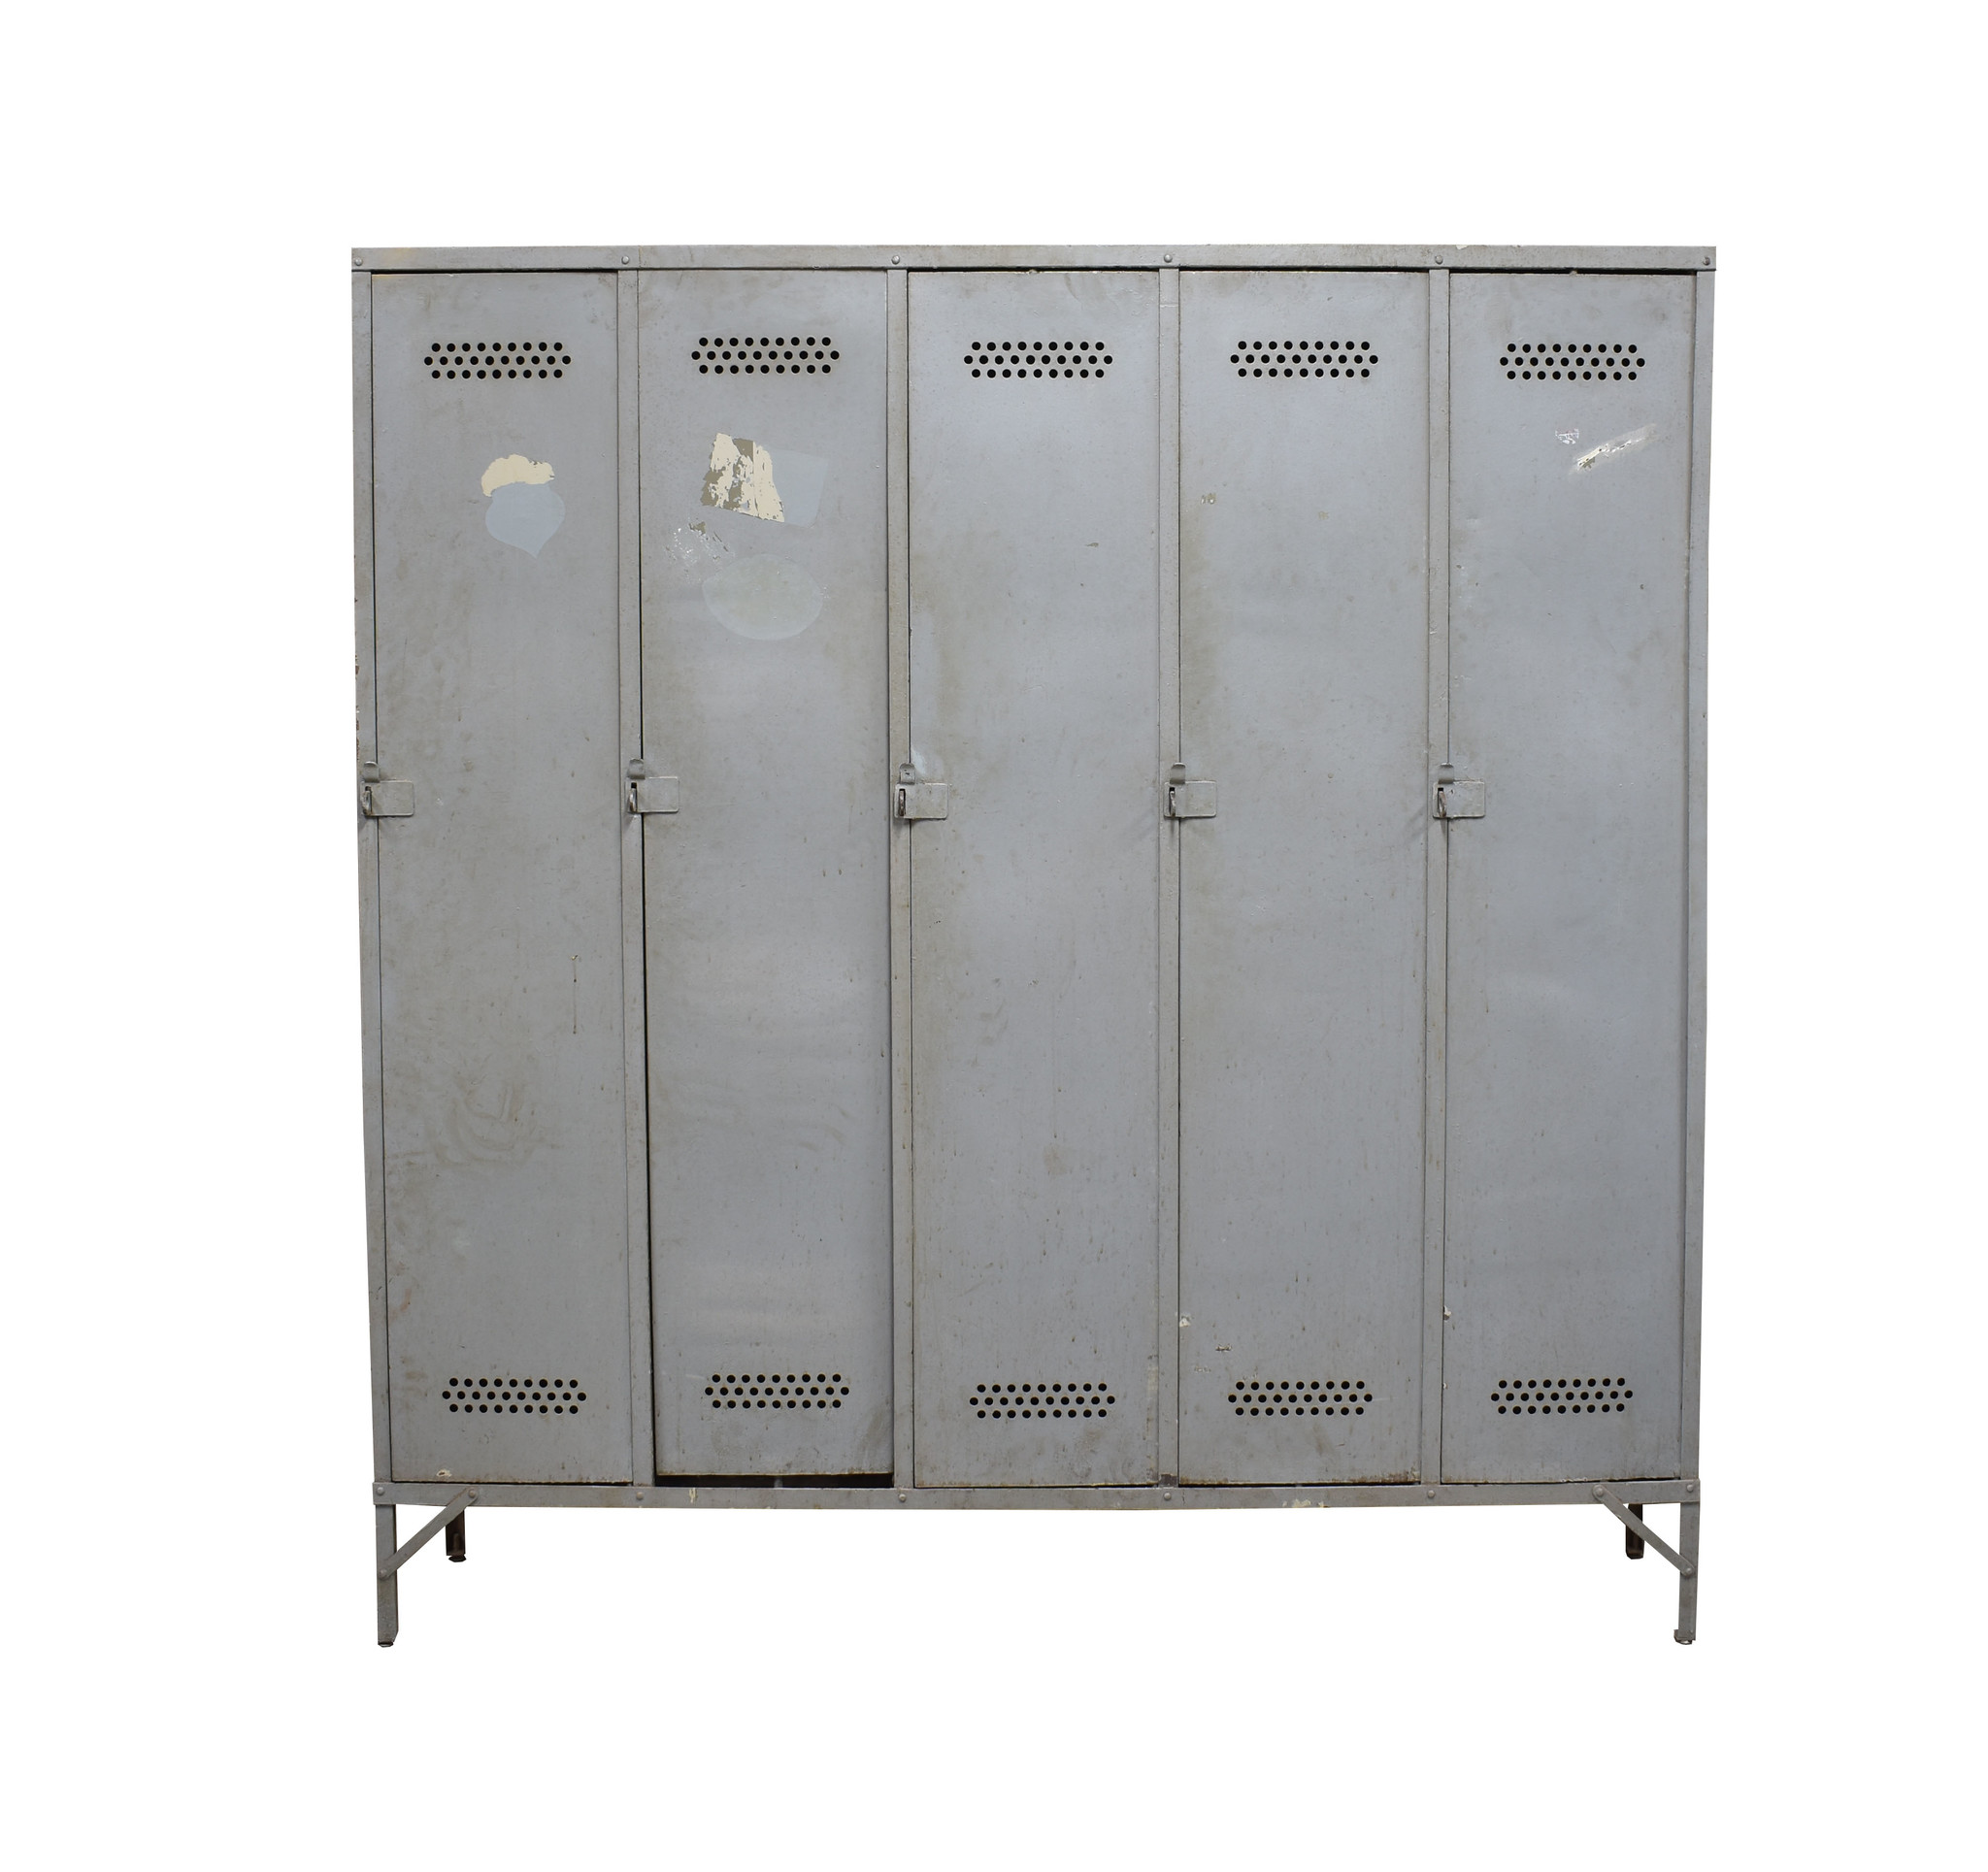 oldwood Stoere metalen locker